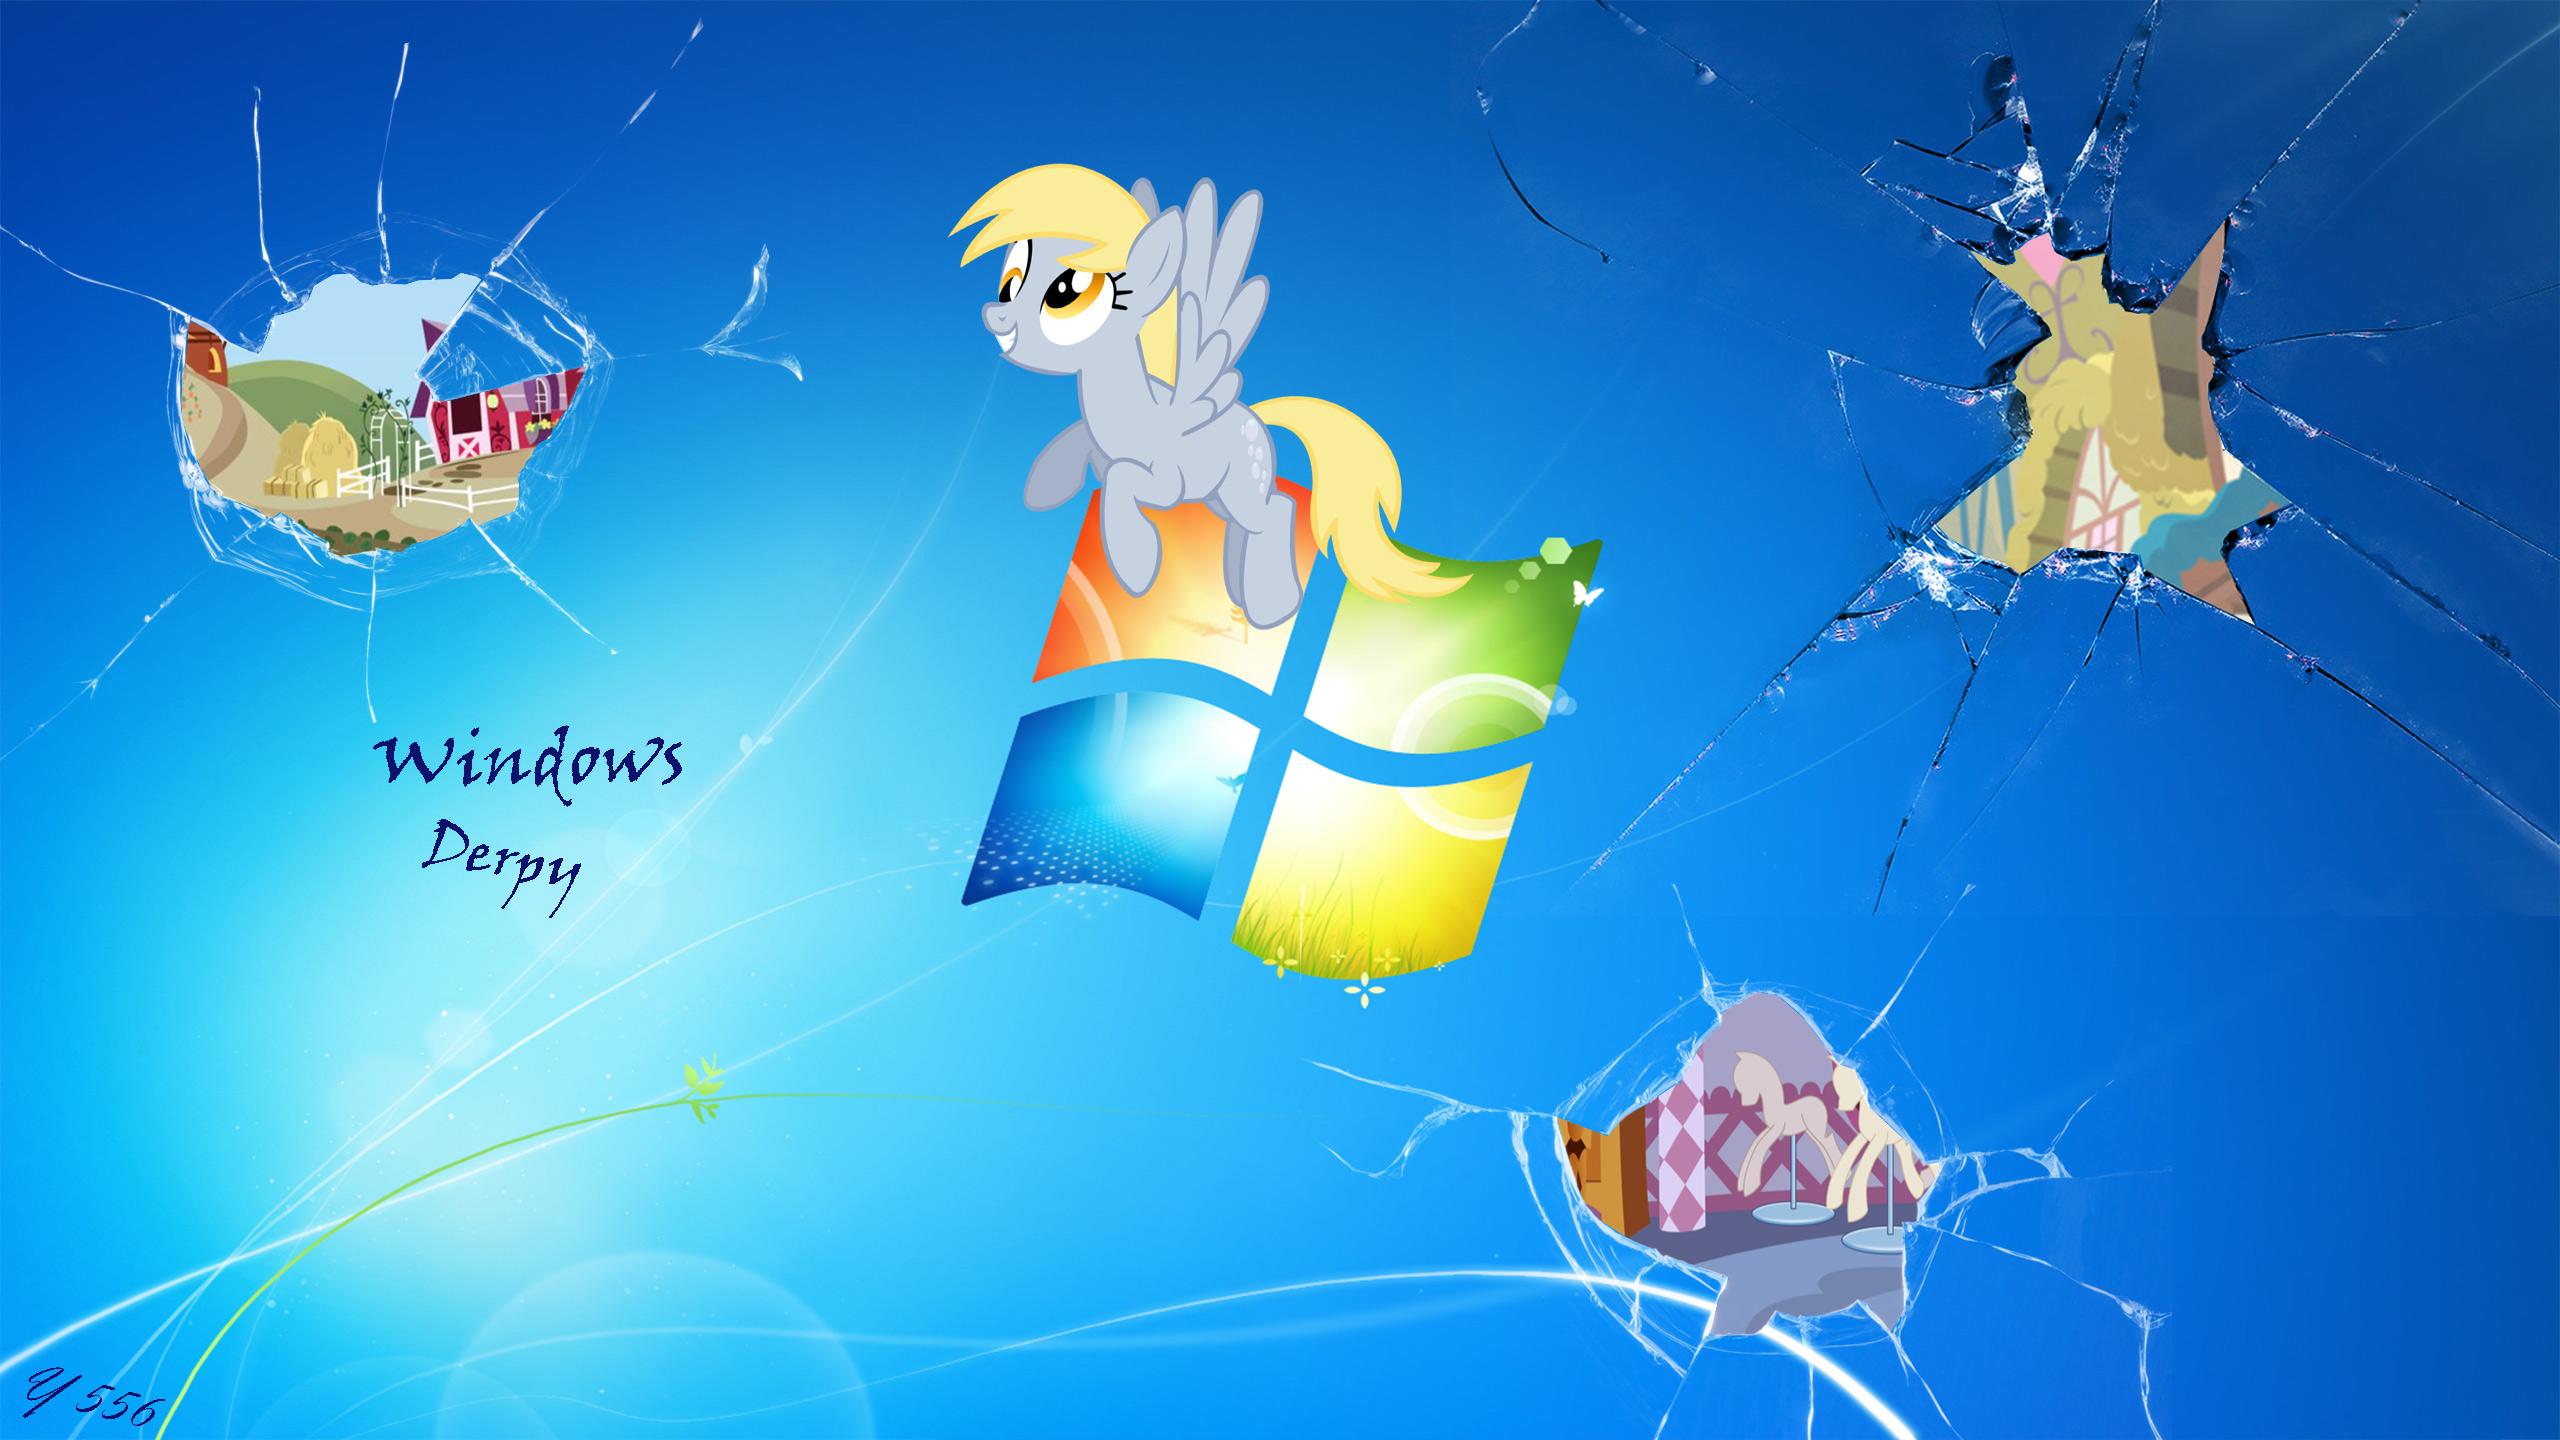 Windows Derpy By Youki506